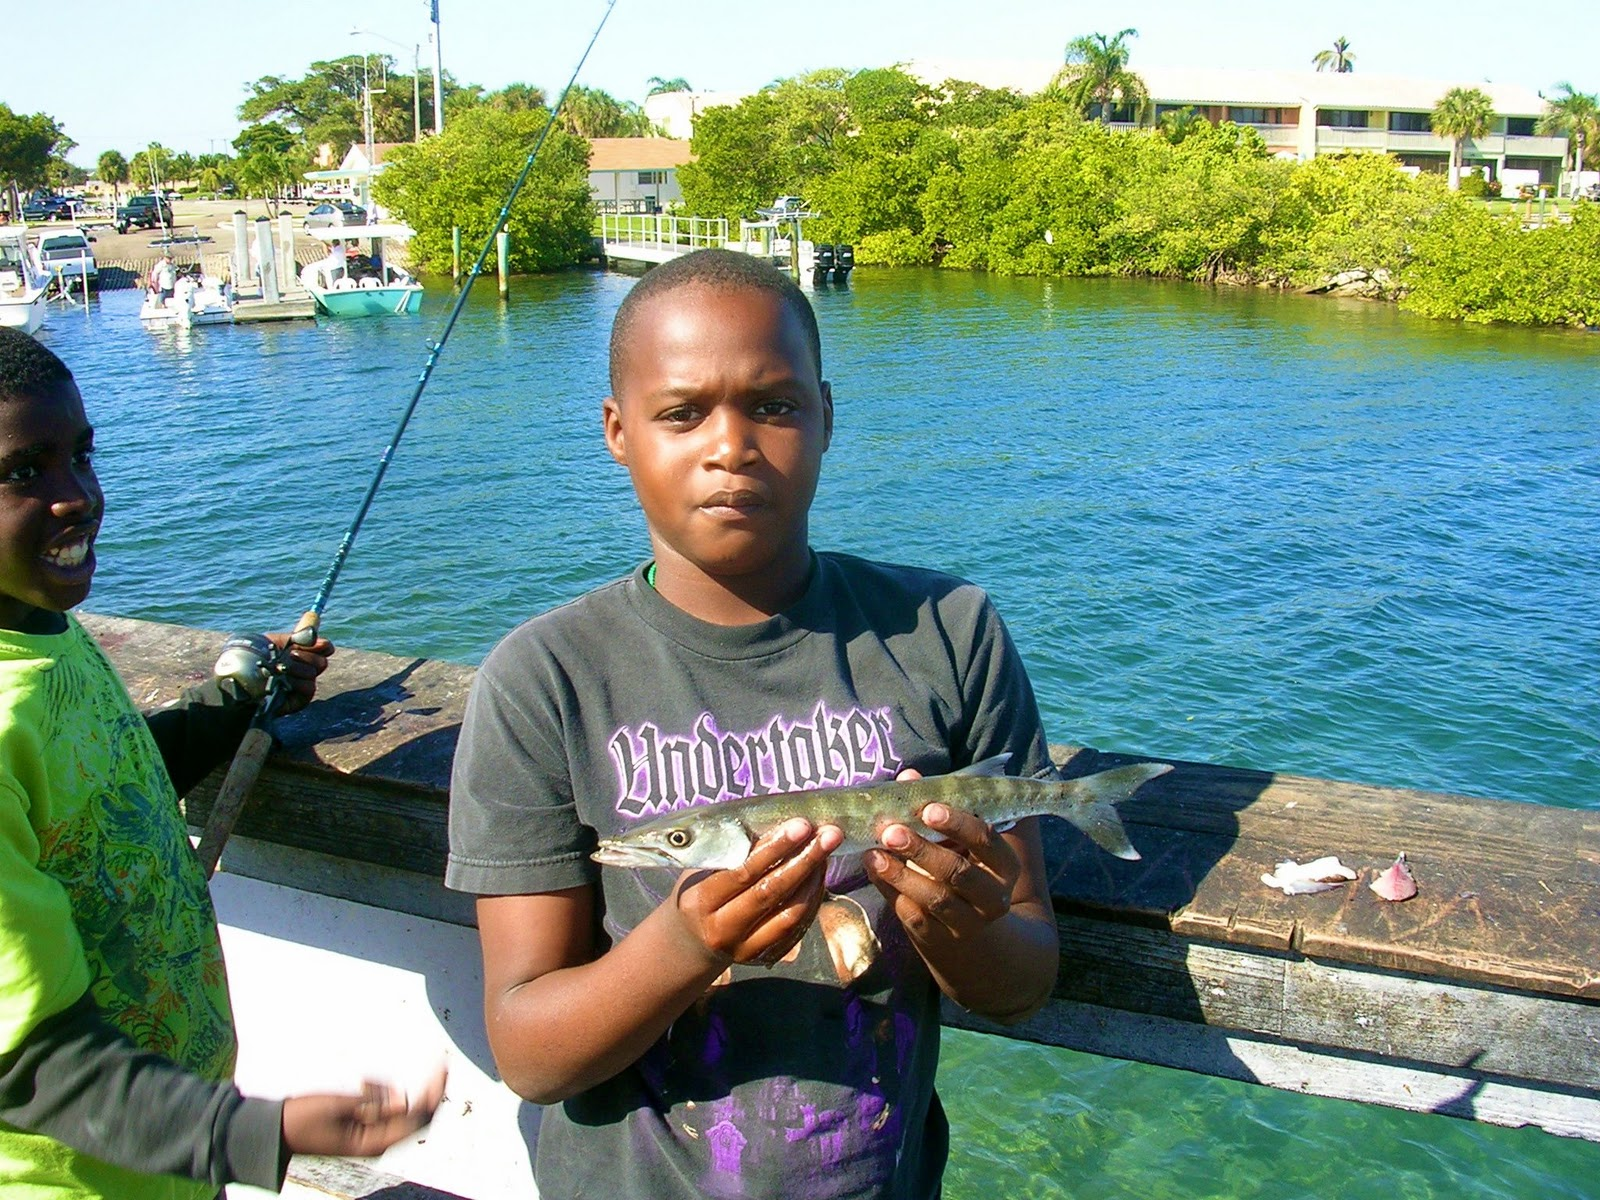 Florida fishing academy boynton holiday boat parade and for Boynton beach fishing